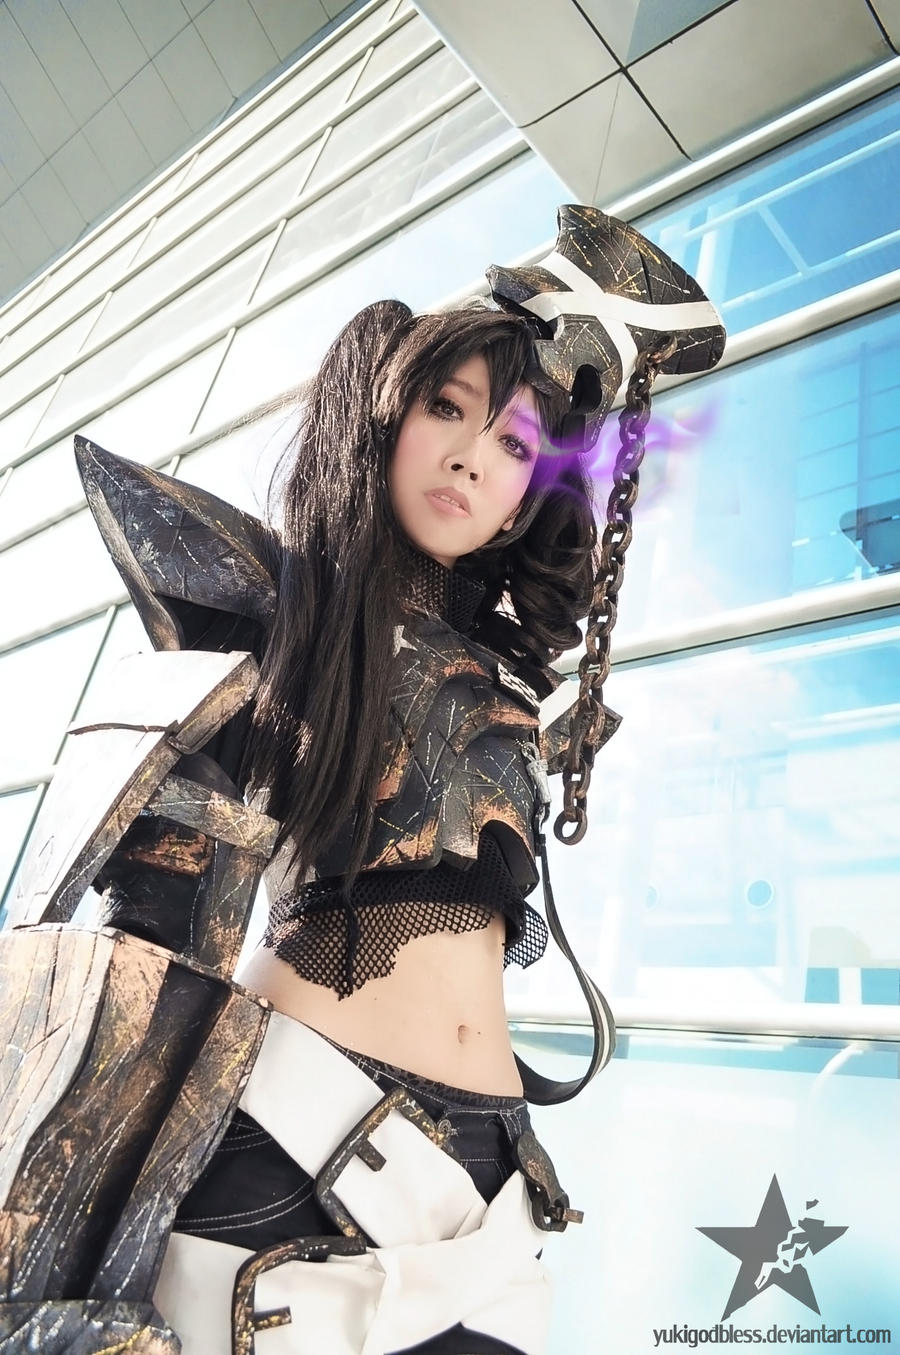 YukigodBless ~ Natthar Janjarhatsin Insaneblackrockshooter6_by_yukigodbless-d335hys